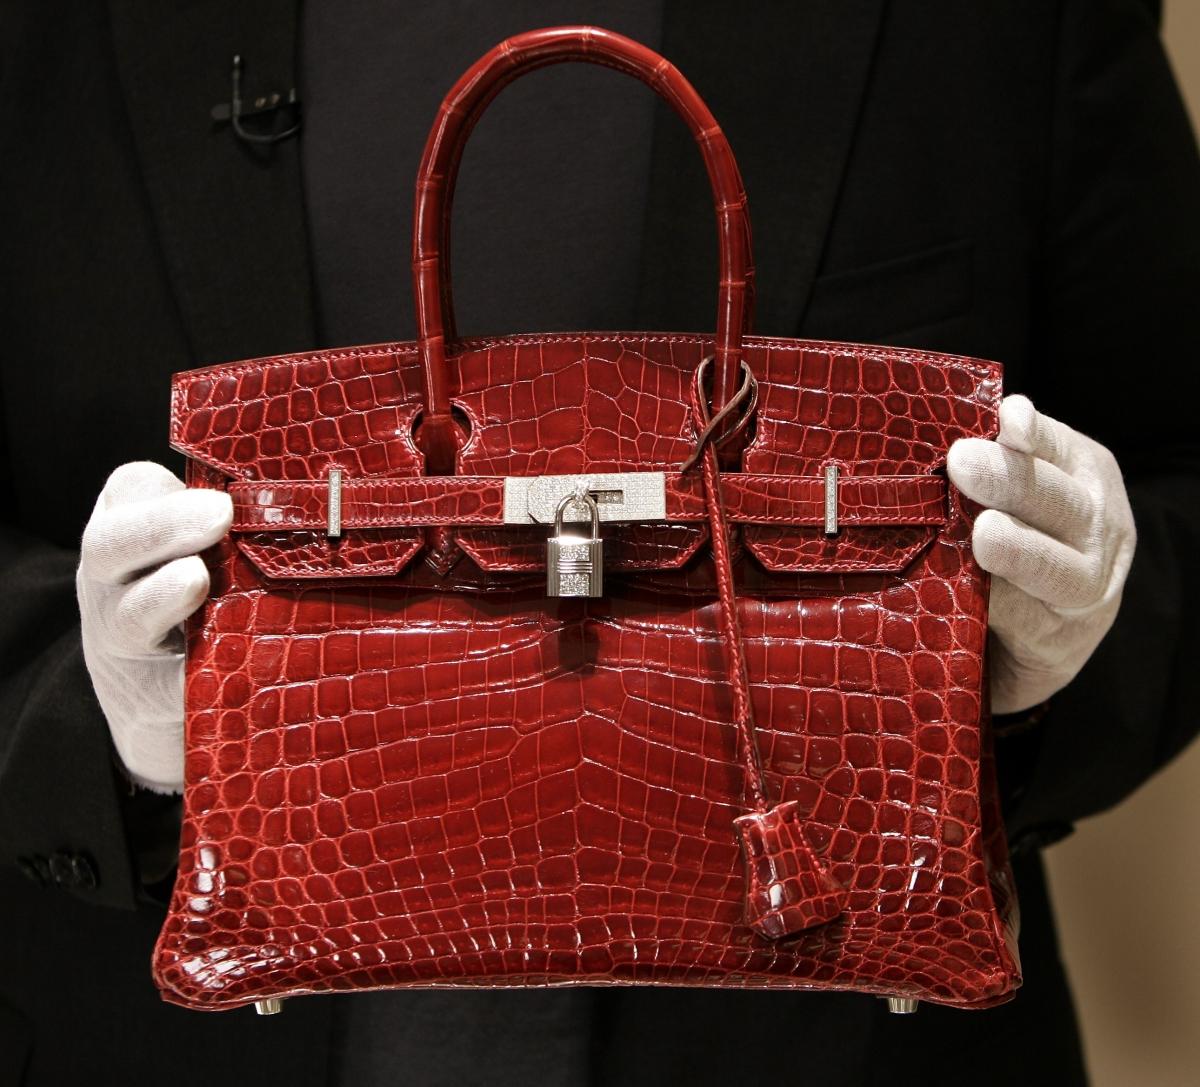 Hermes Birkin bag worth more than gold